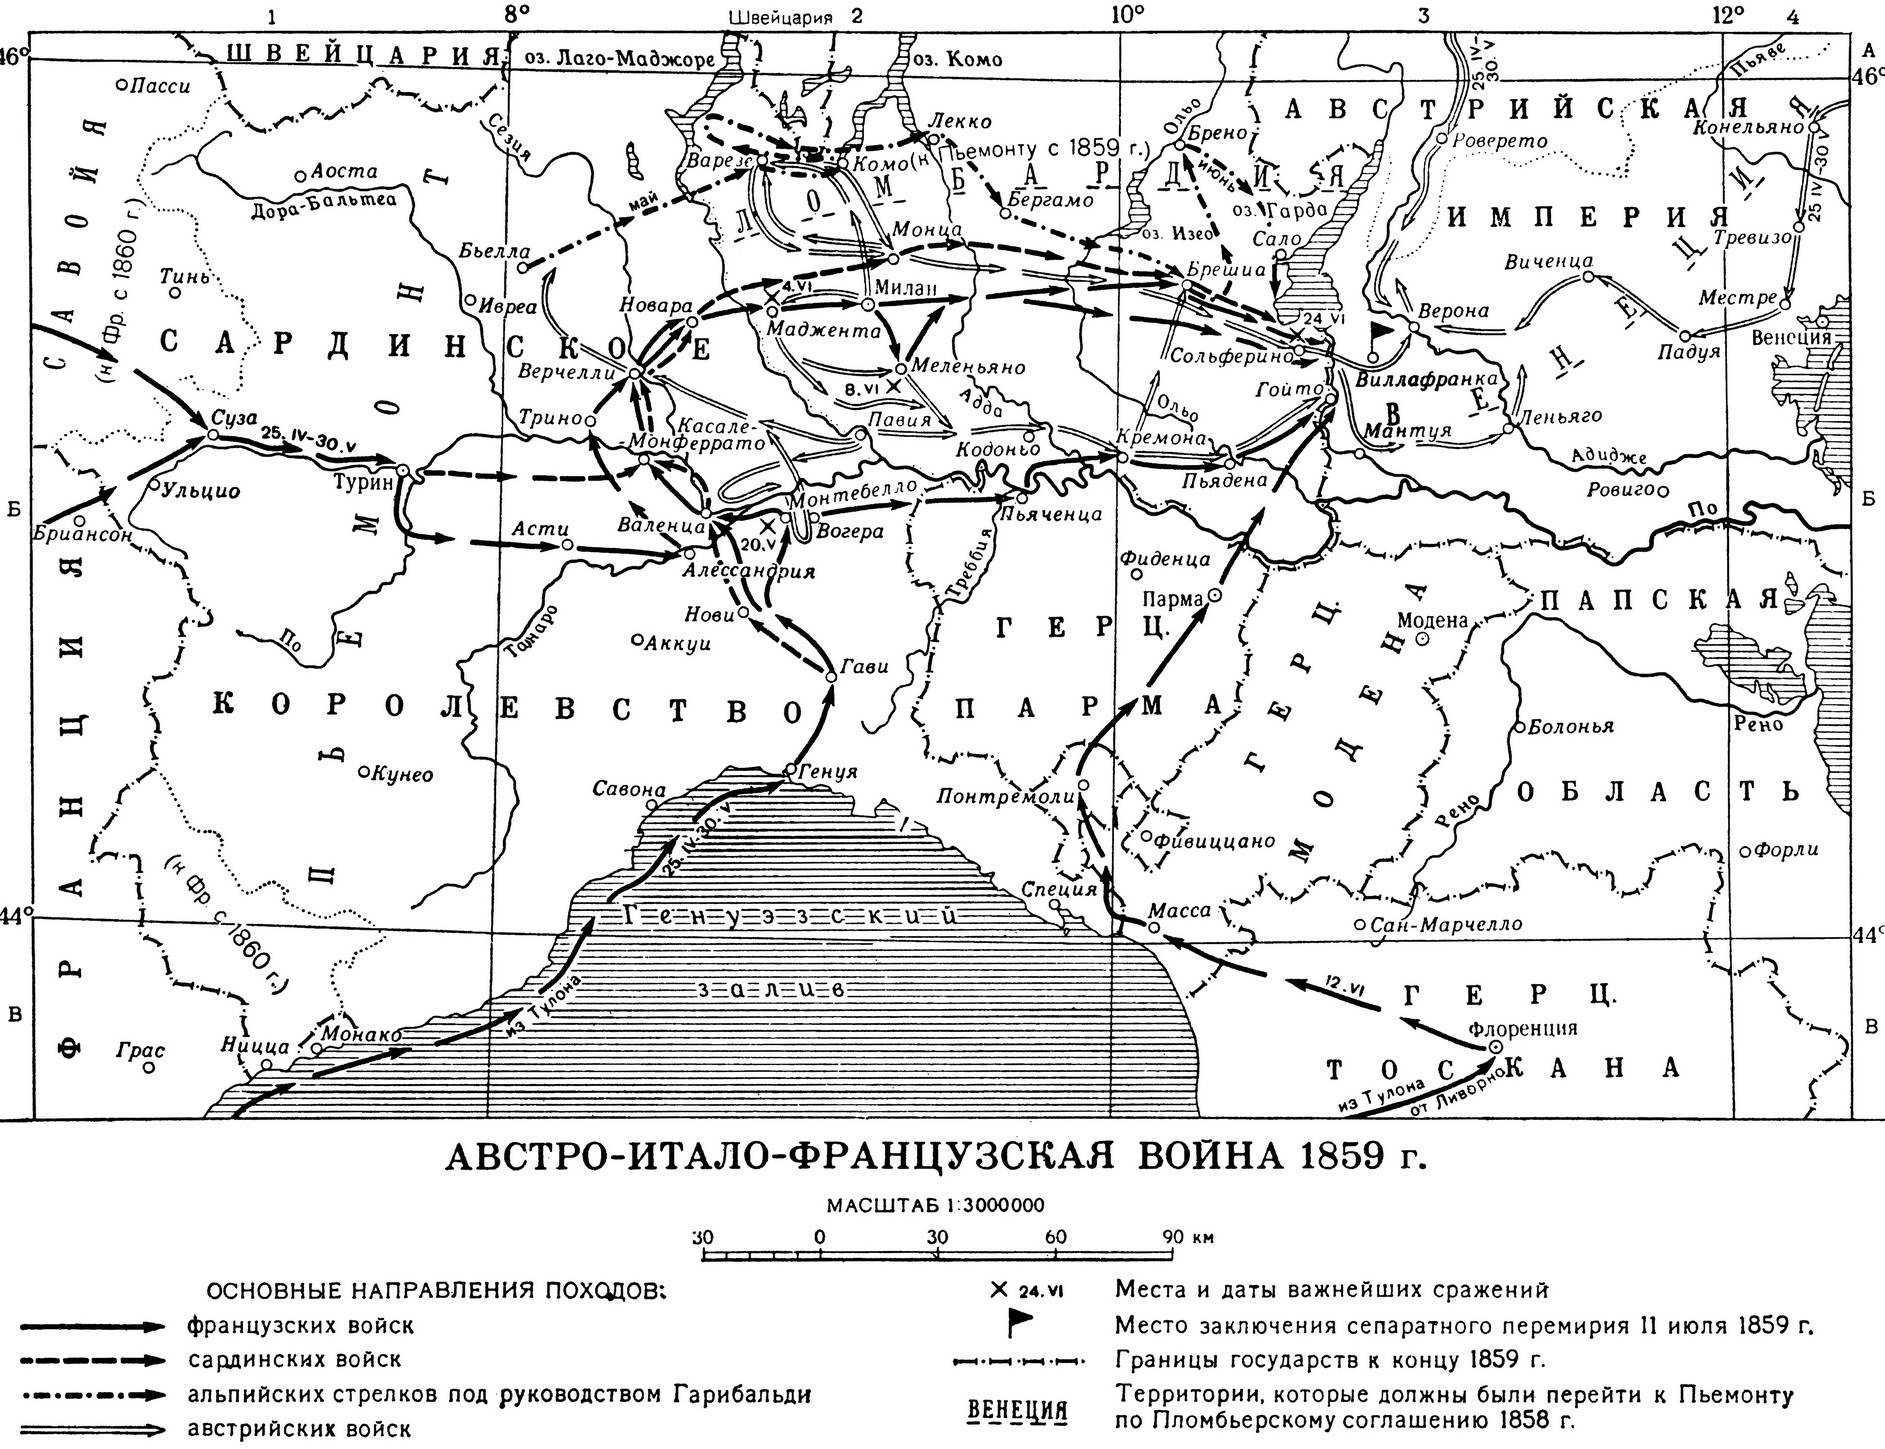 АВСТРОИТАЛОФРАНЦУЗСКАЯ ВОЙНА 1859 фото №2